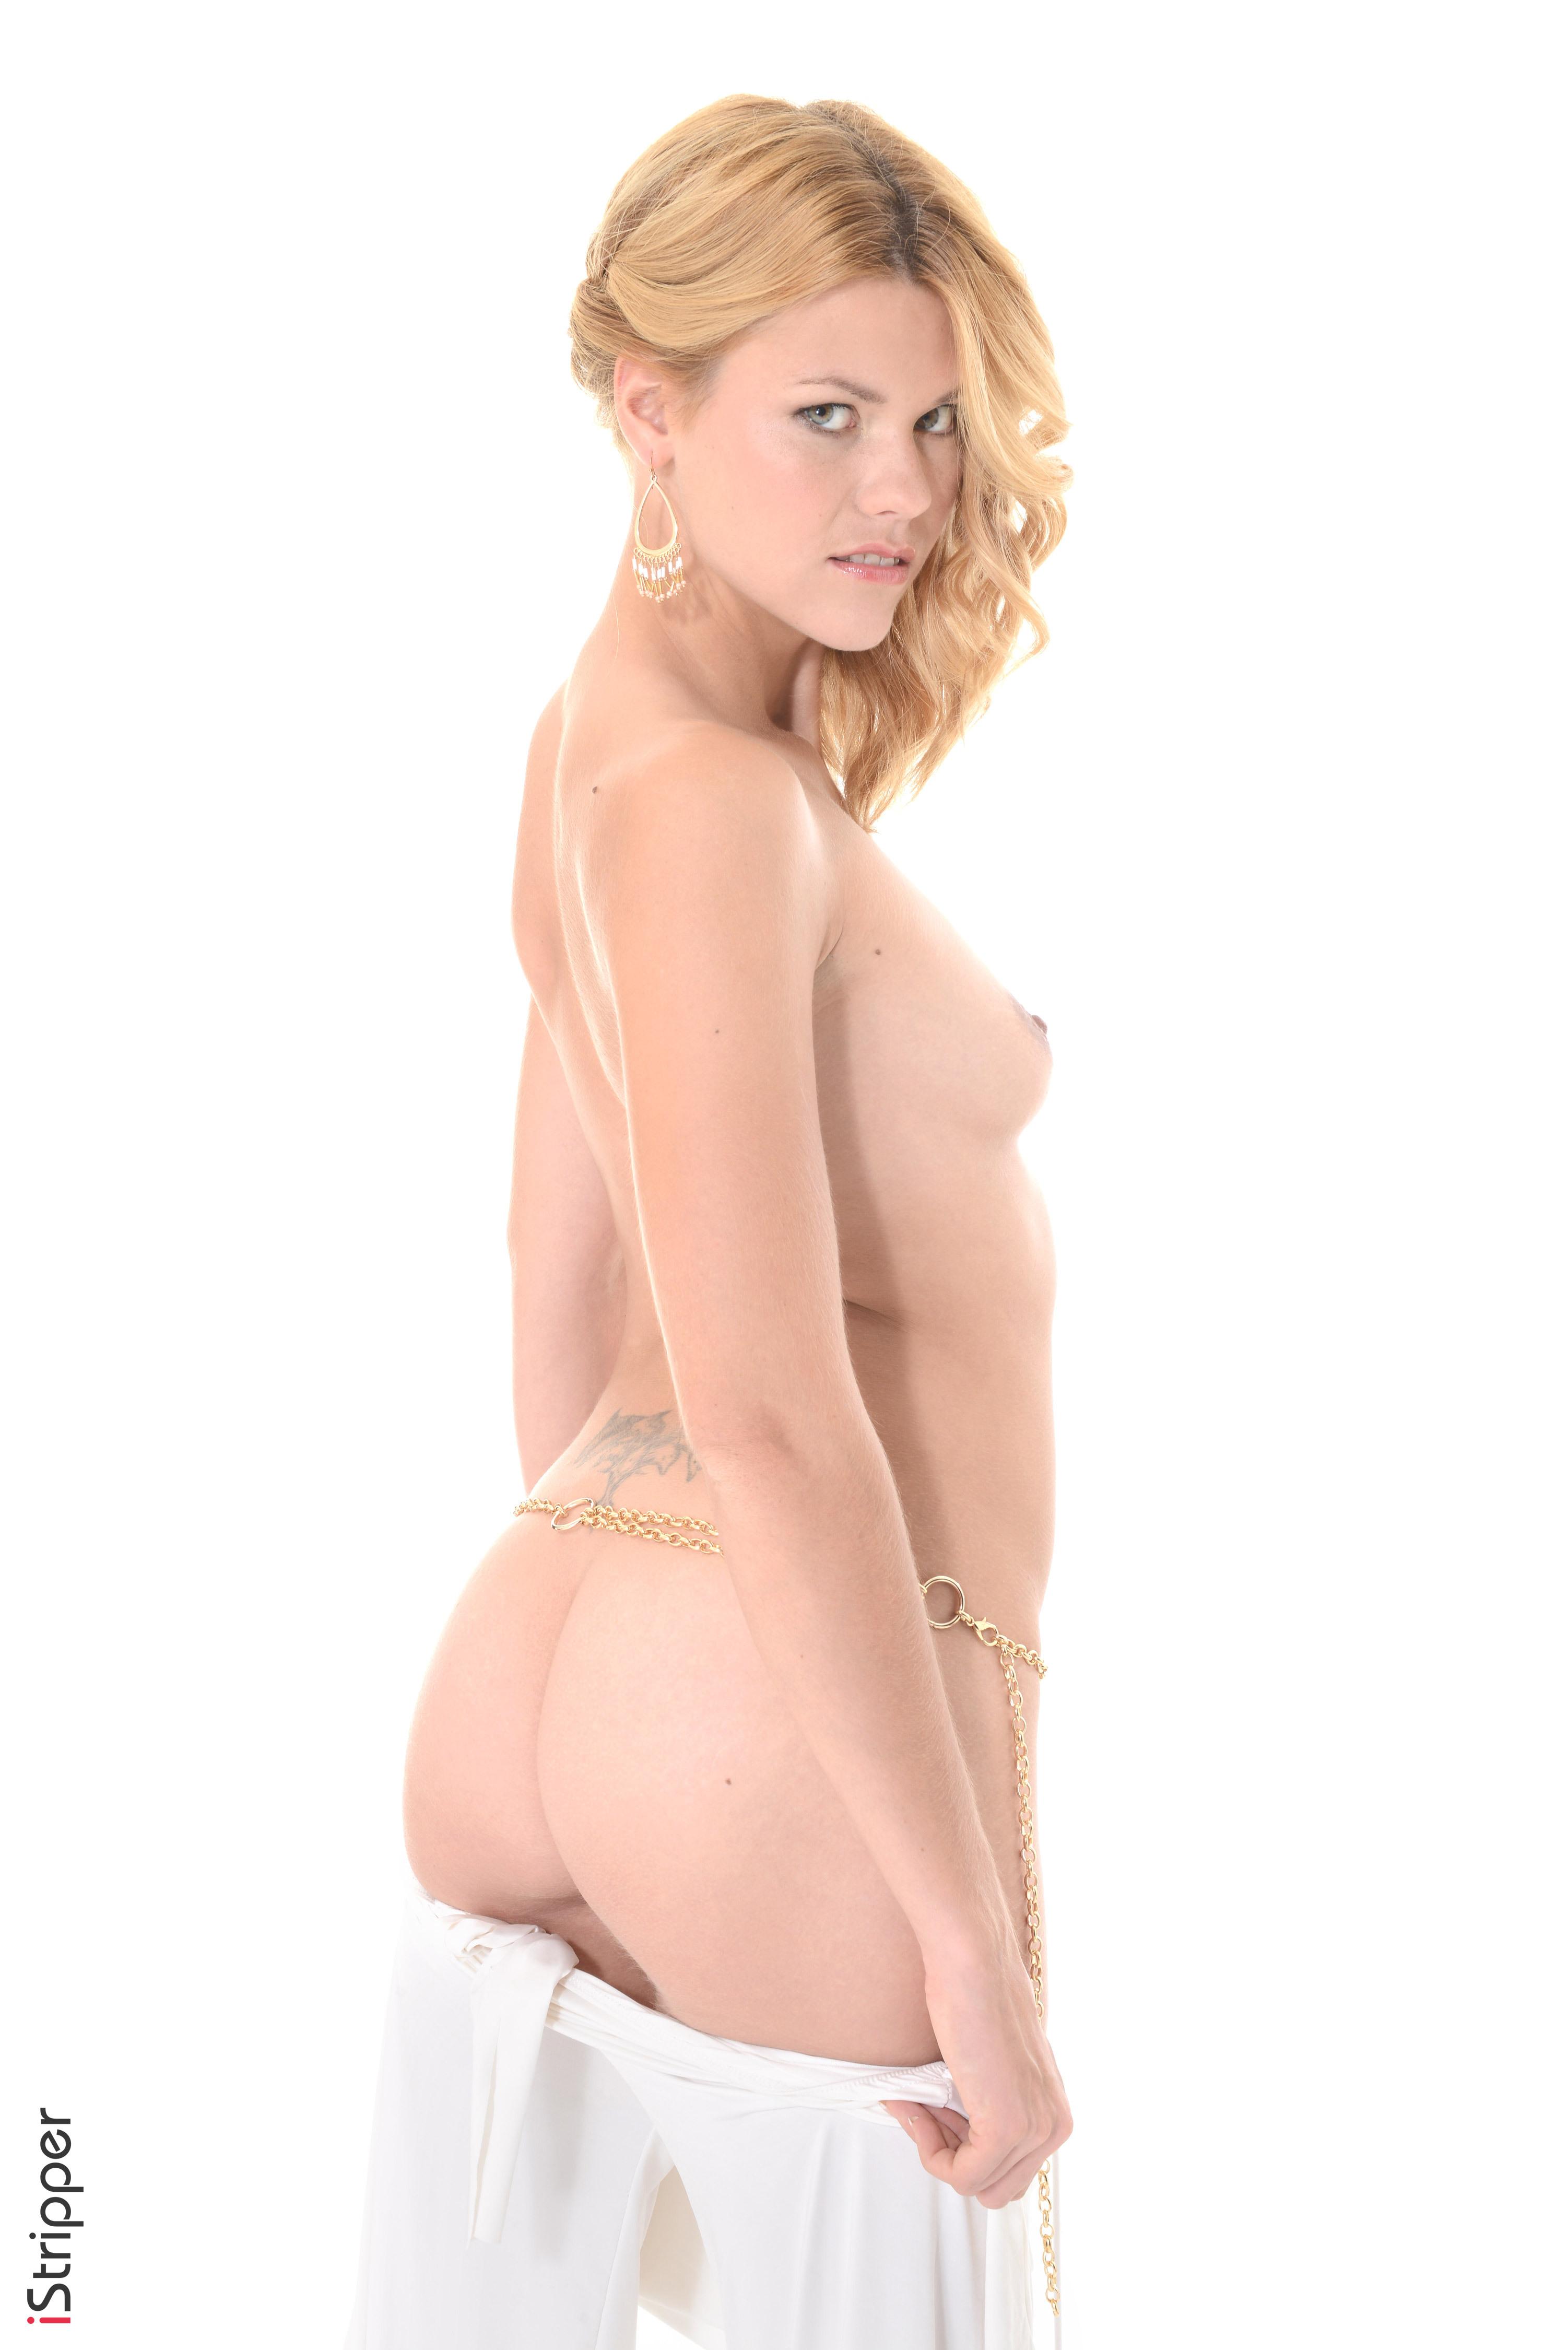 big boob asian american girls stripping naked